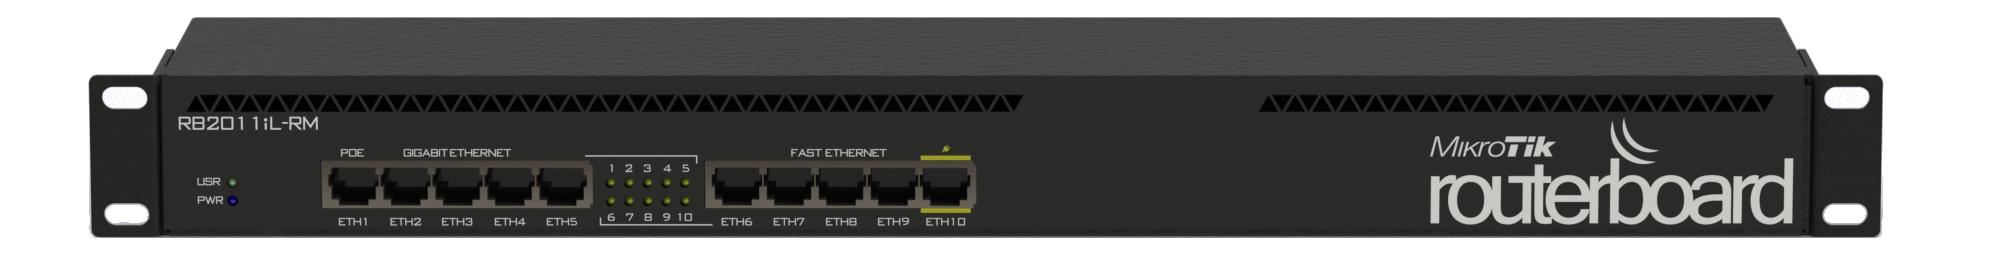 RB2011IL-mikrotik-router-compratecno